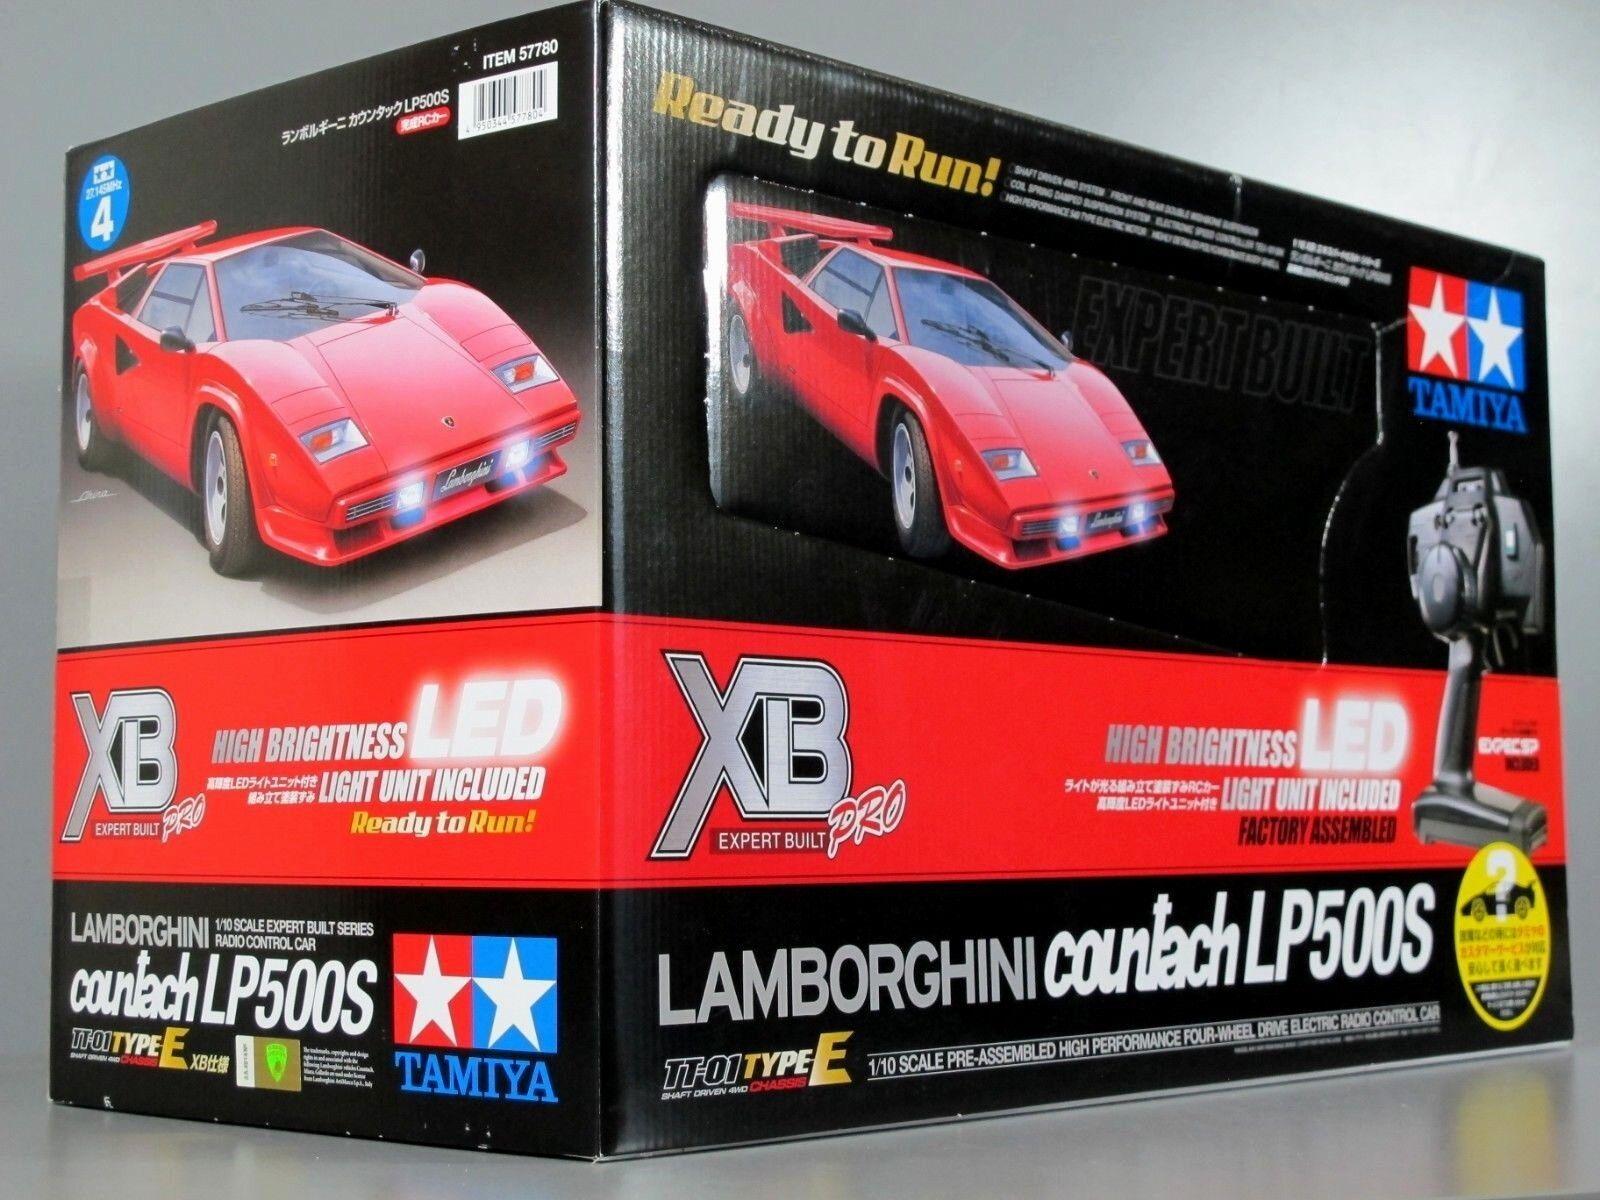 Rare Nuovo Tamiya 1/10 RC rosso Lamborghini Countach LP500S XB Expert Build  57780